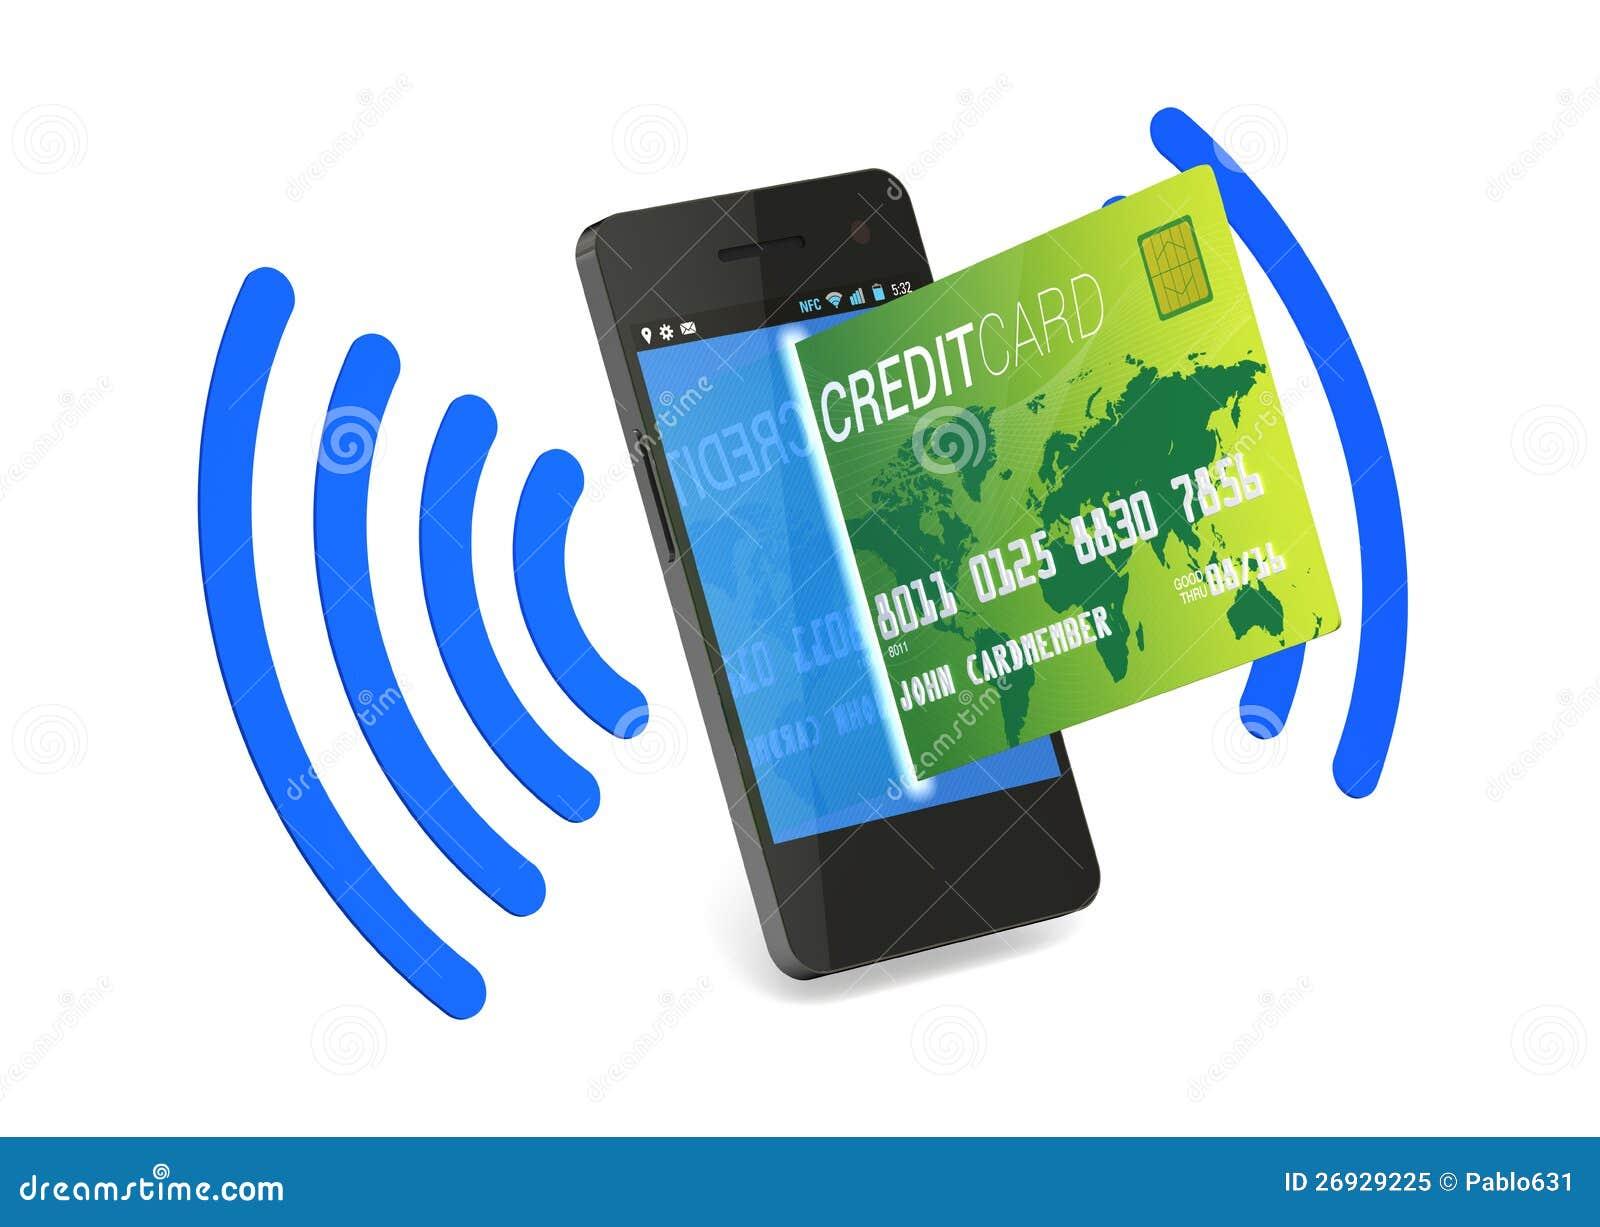 Digitale Creditcard NFC